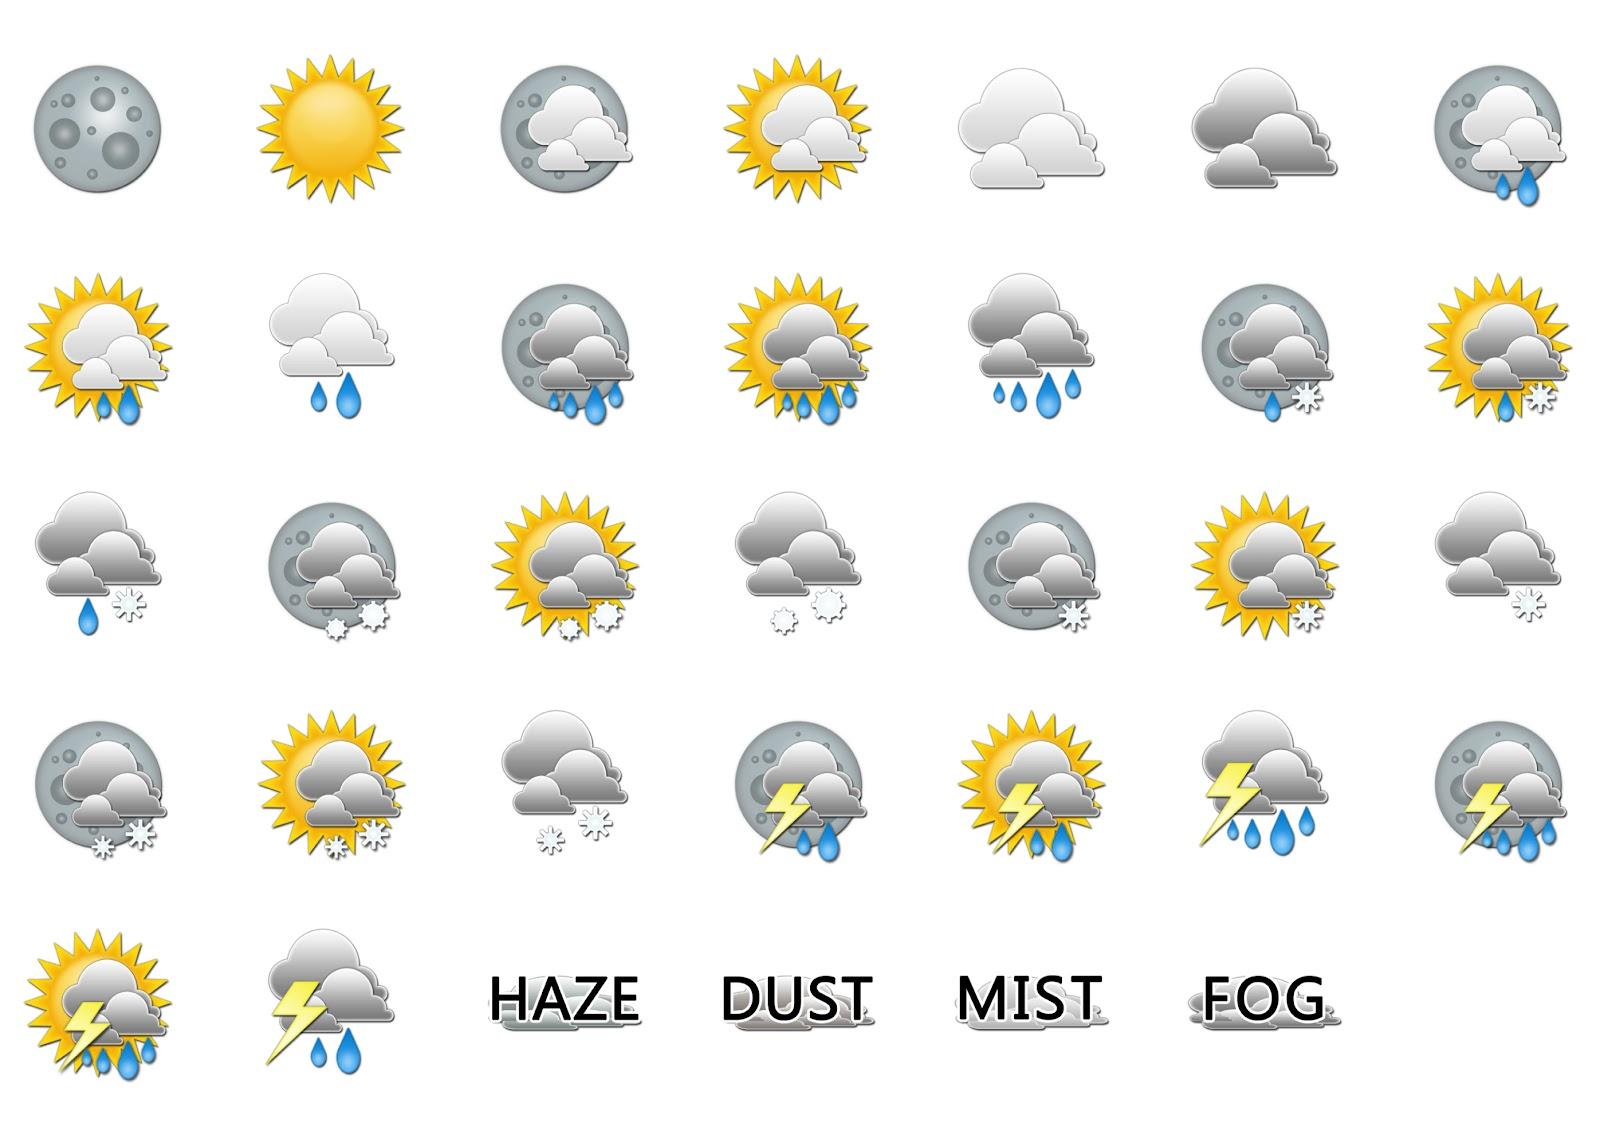 Sunny Weather Icons Weather icons: imgarcade.com/1/sunny-weather-icons